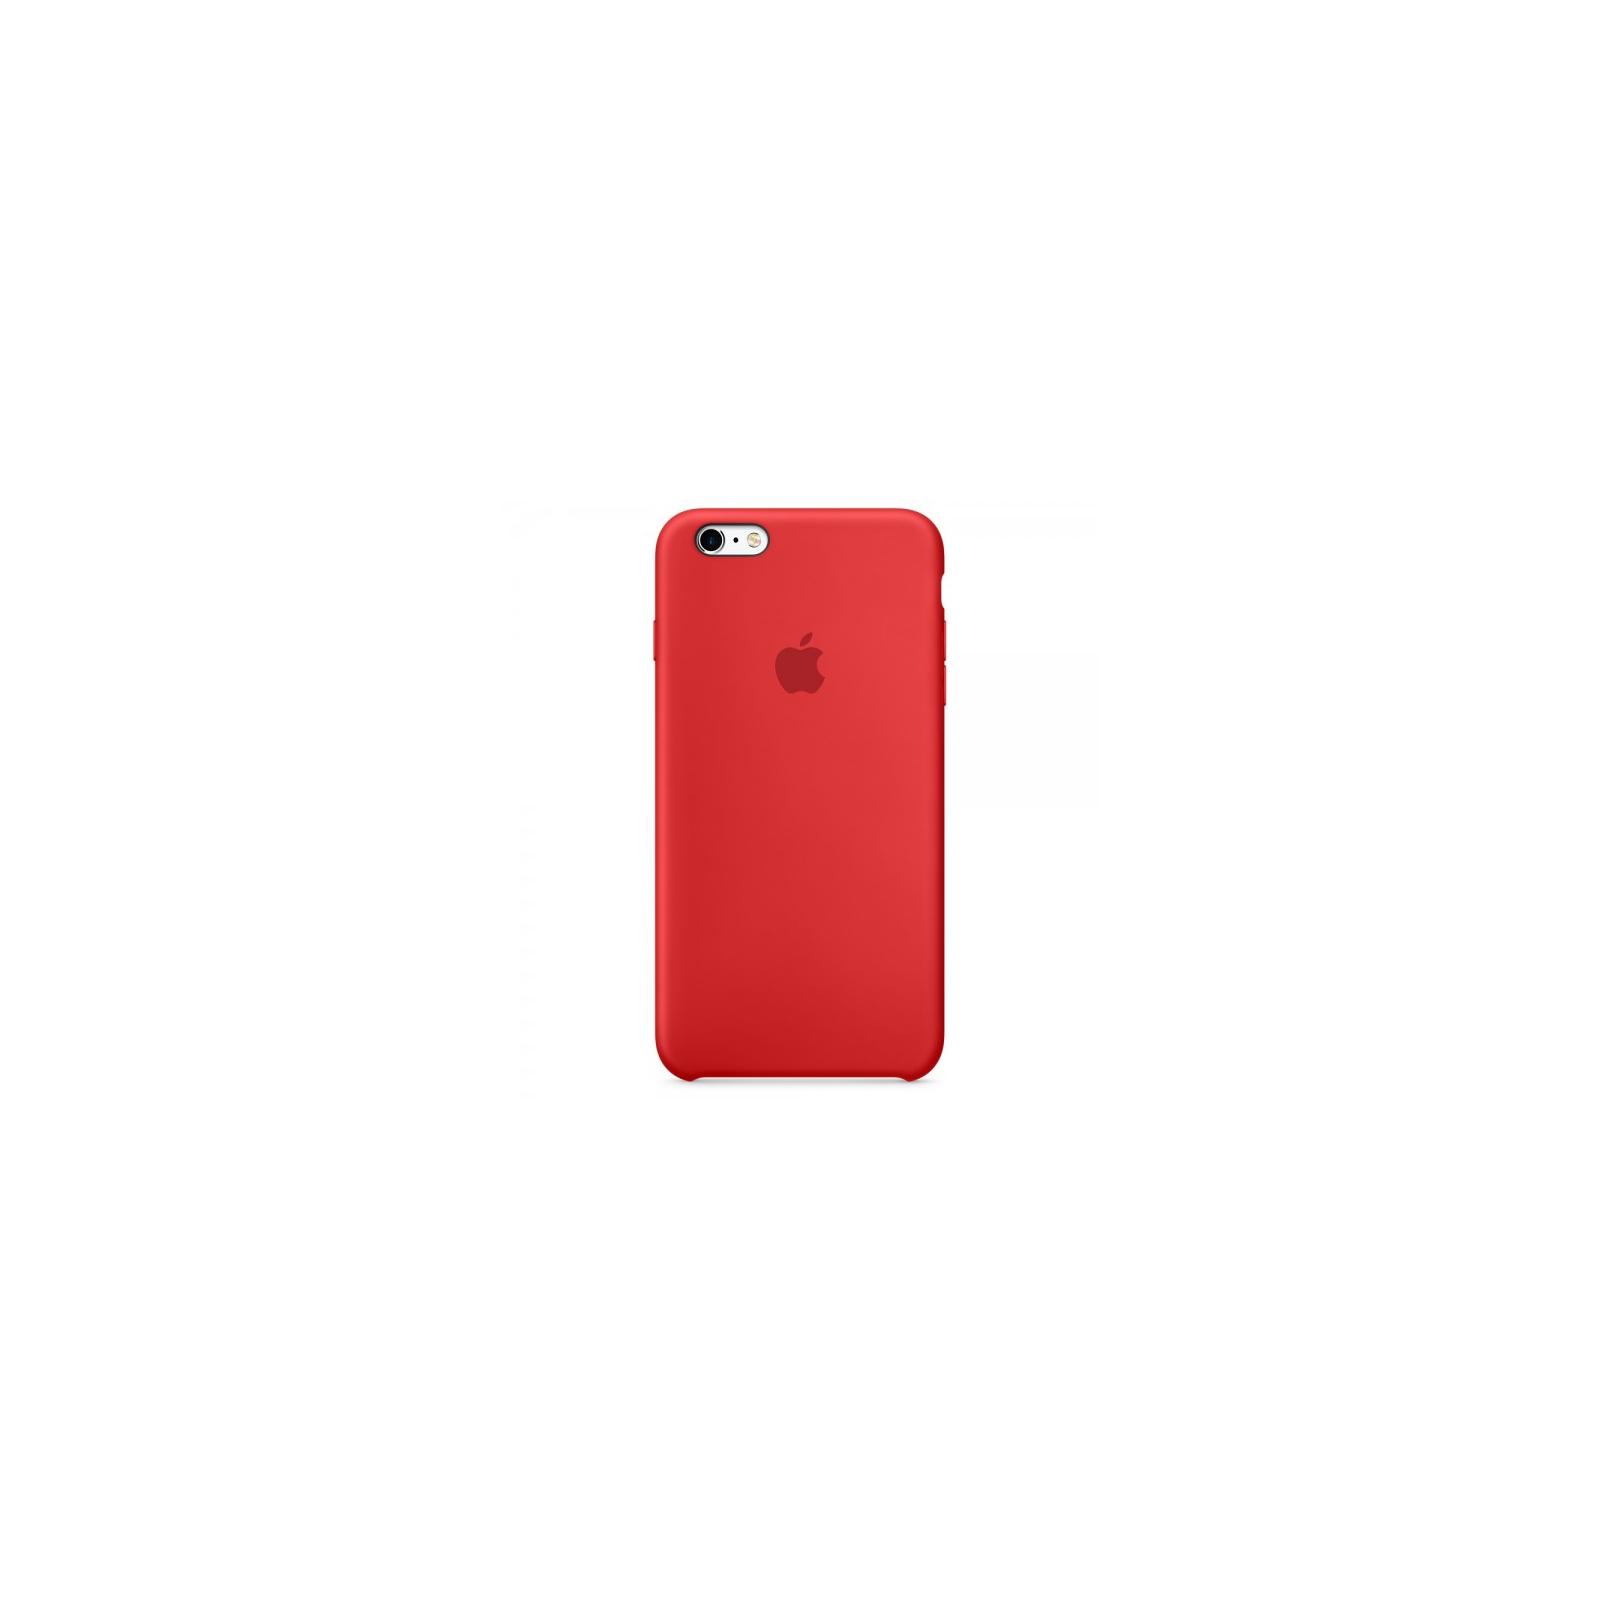 Чехол для моб. телефона Apple для iPhone 6/6s PRODUCT(RED) (MKY32ZM/A)